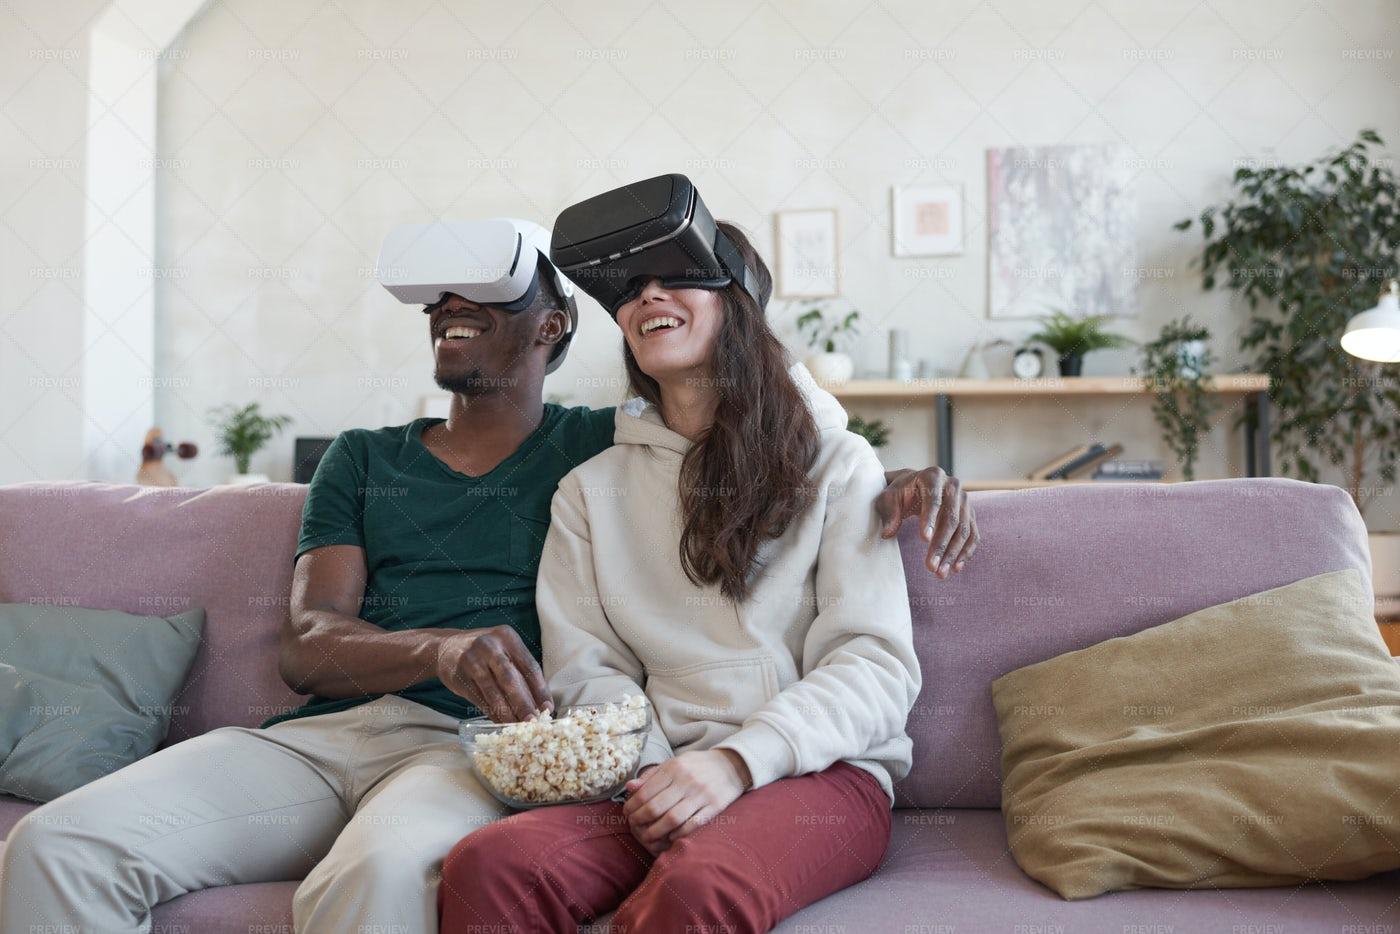 Couple Watching Movie With Popcorn: Stock Photos